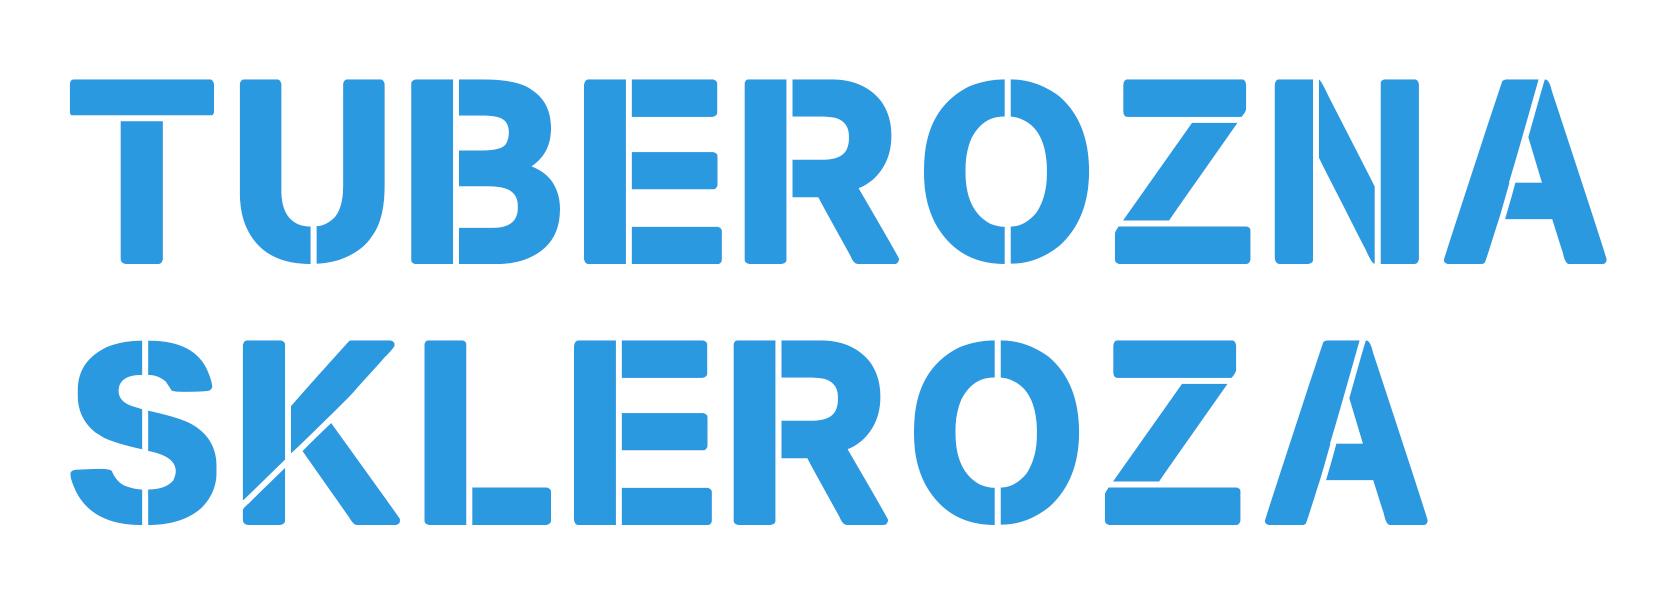 Tuberozna skleroza Logo